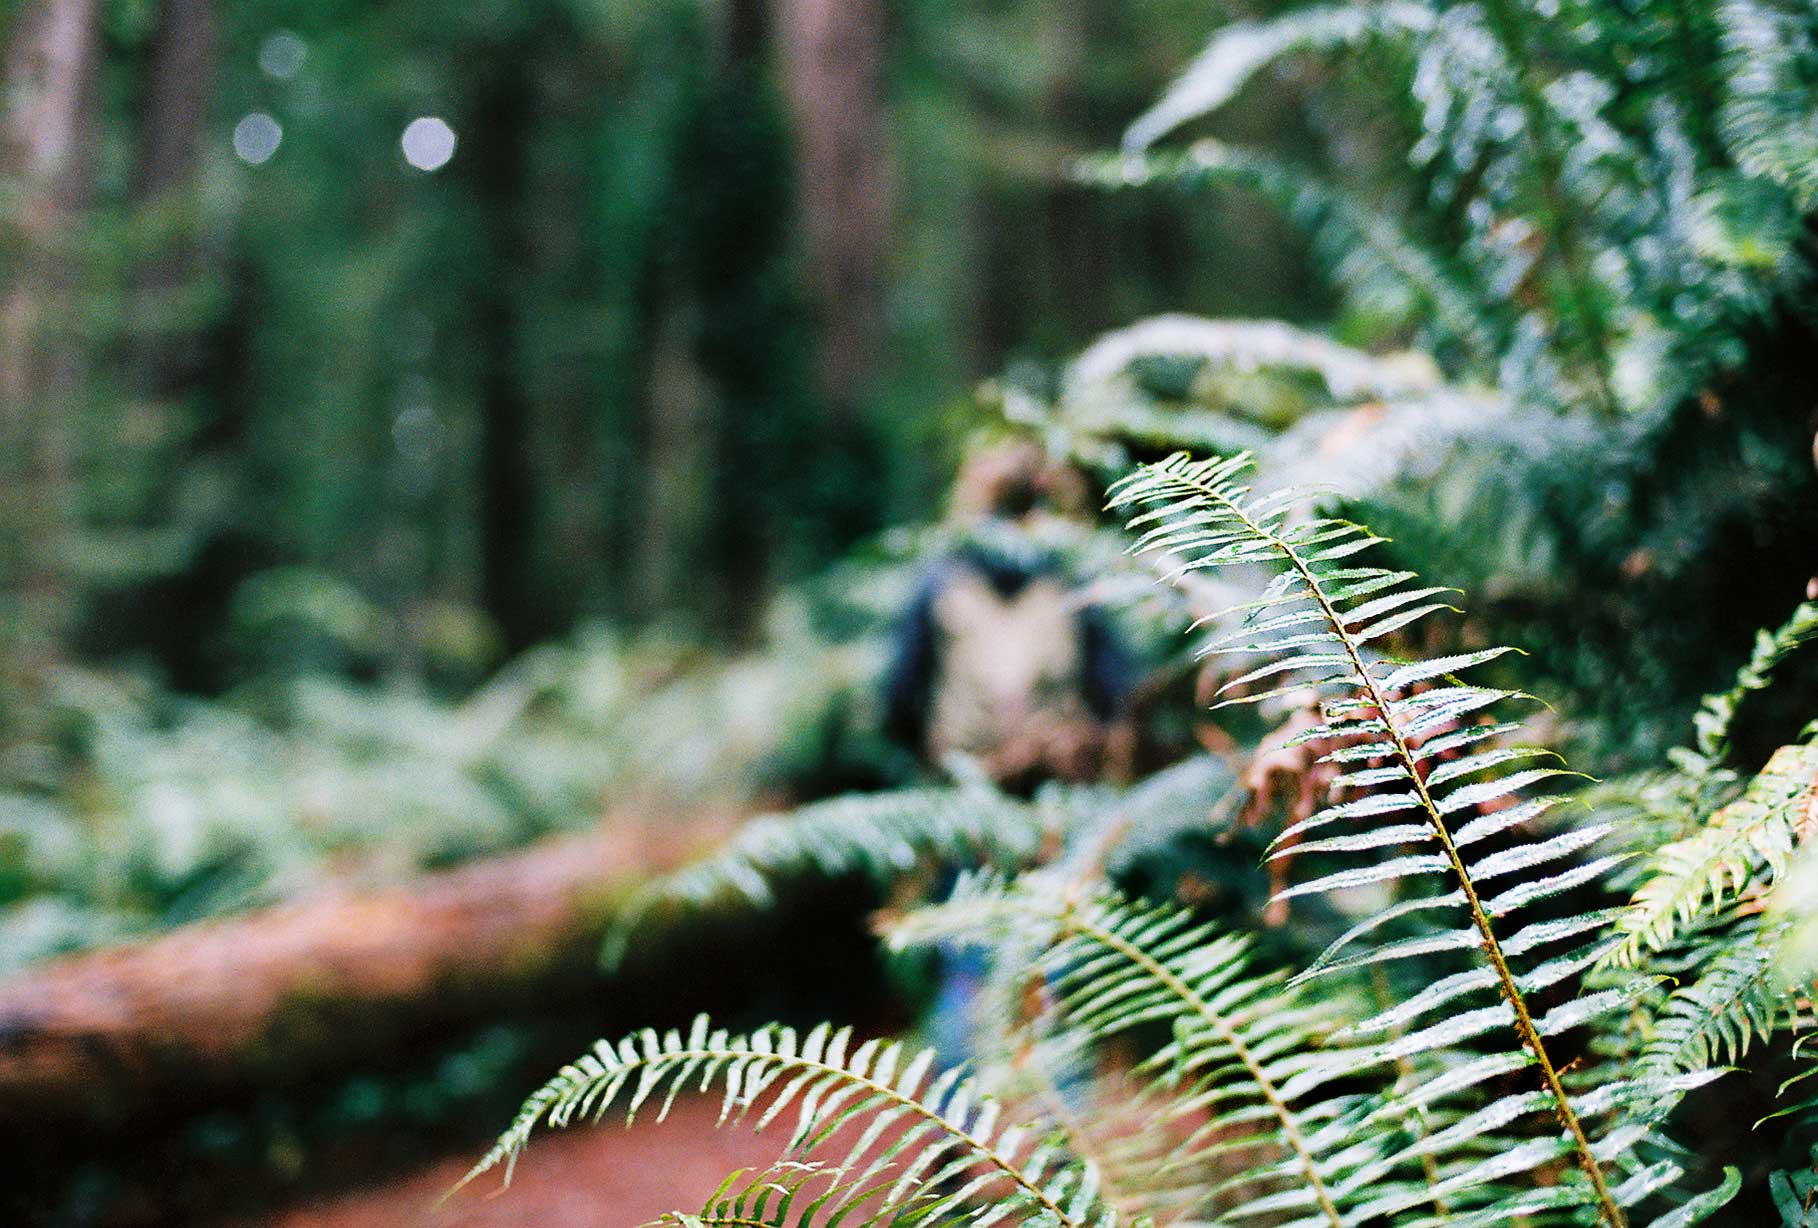 Long walks amongst the Redwood Trees, Humbodlt County, 2017.